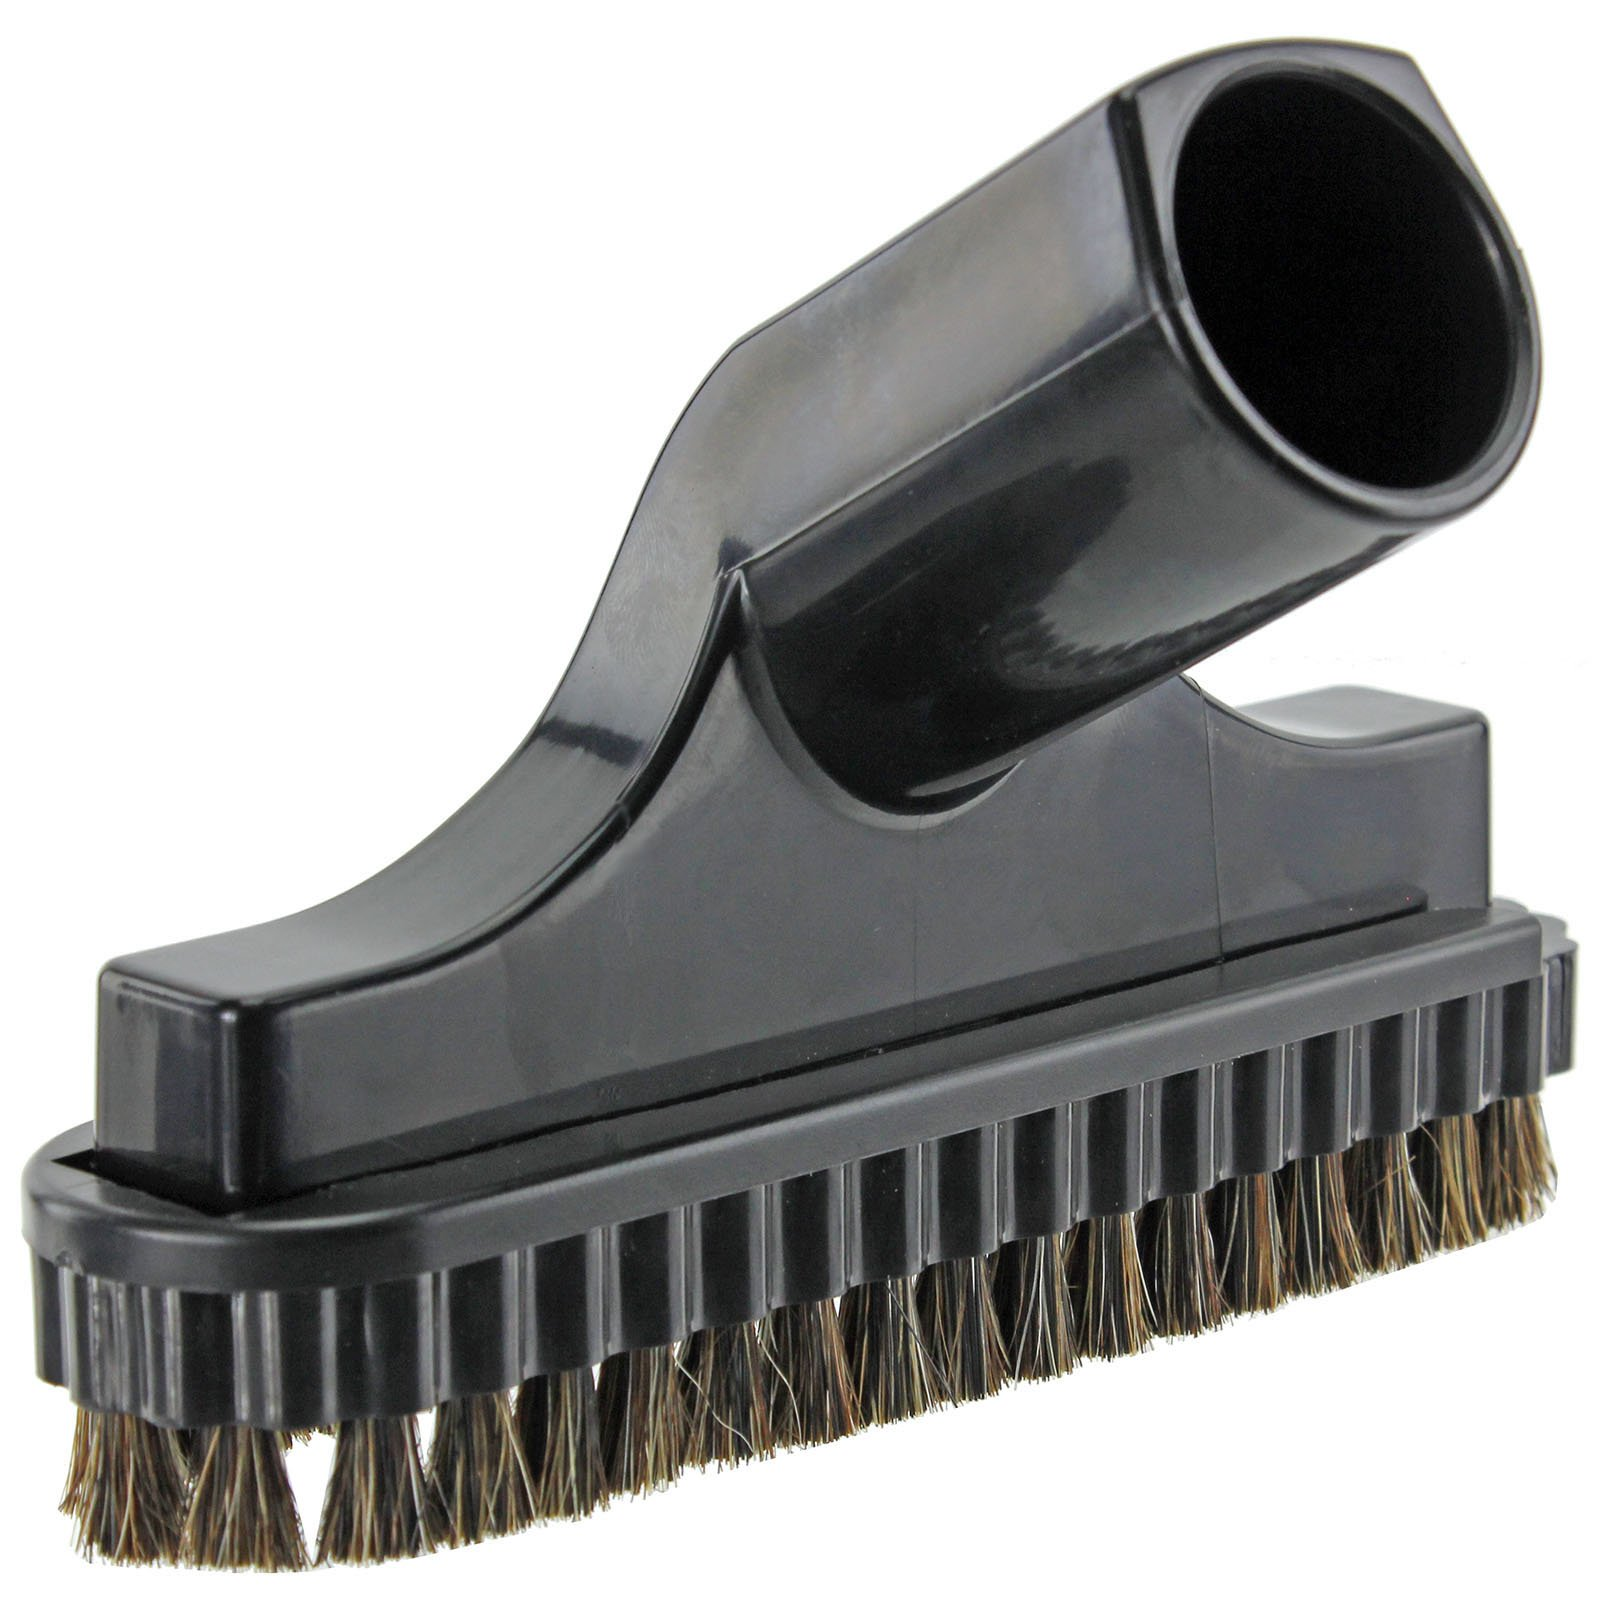 Spares2go - Cepillo para polvo para escalera y tapicería para ...